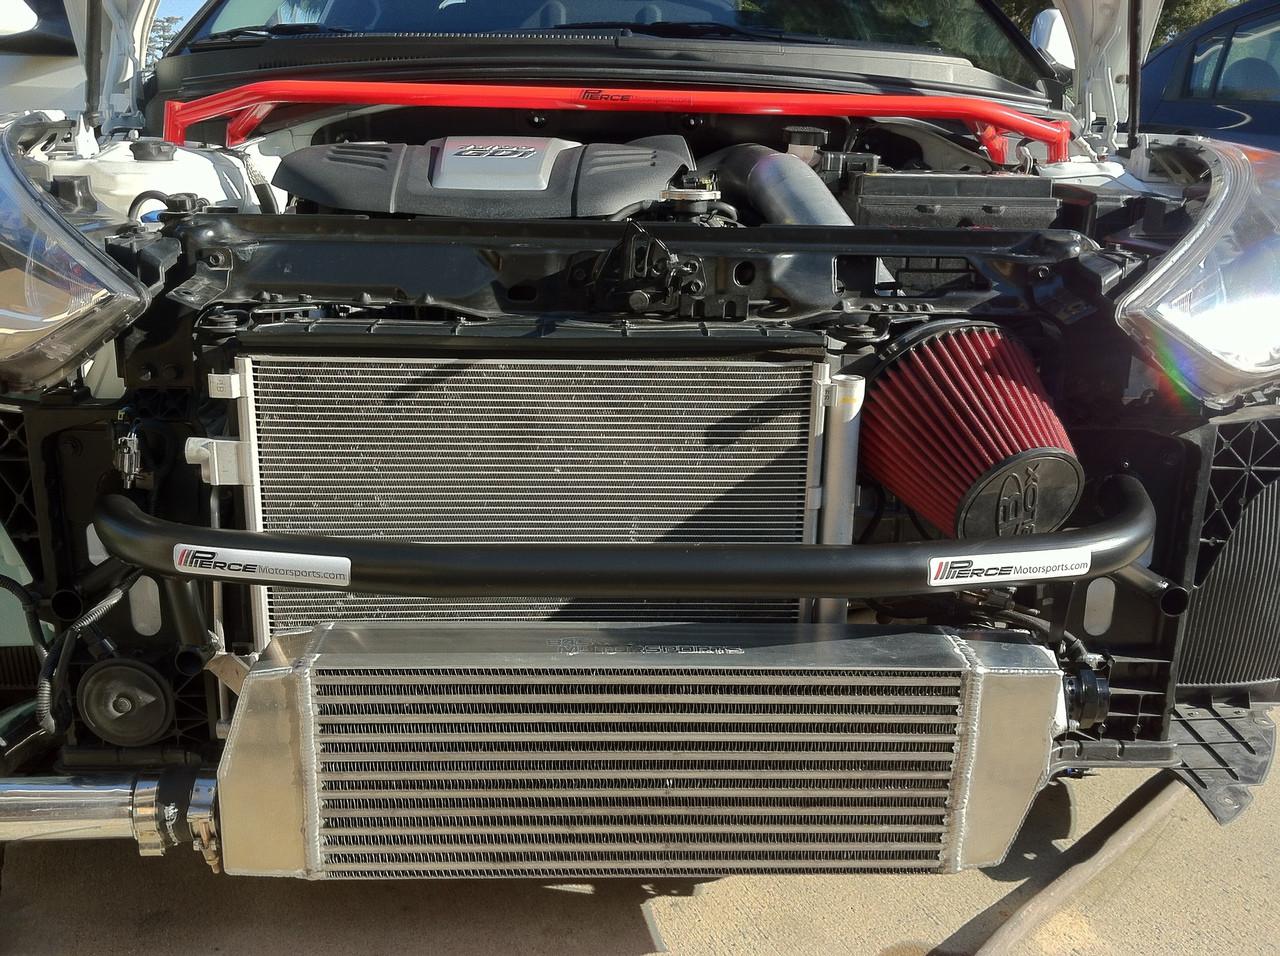 2012-2018 Hyundai Veloster Turbo Tubular Crashbar with IC Relocation